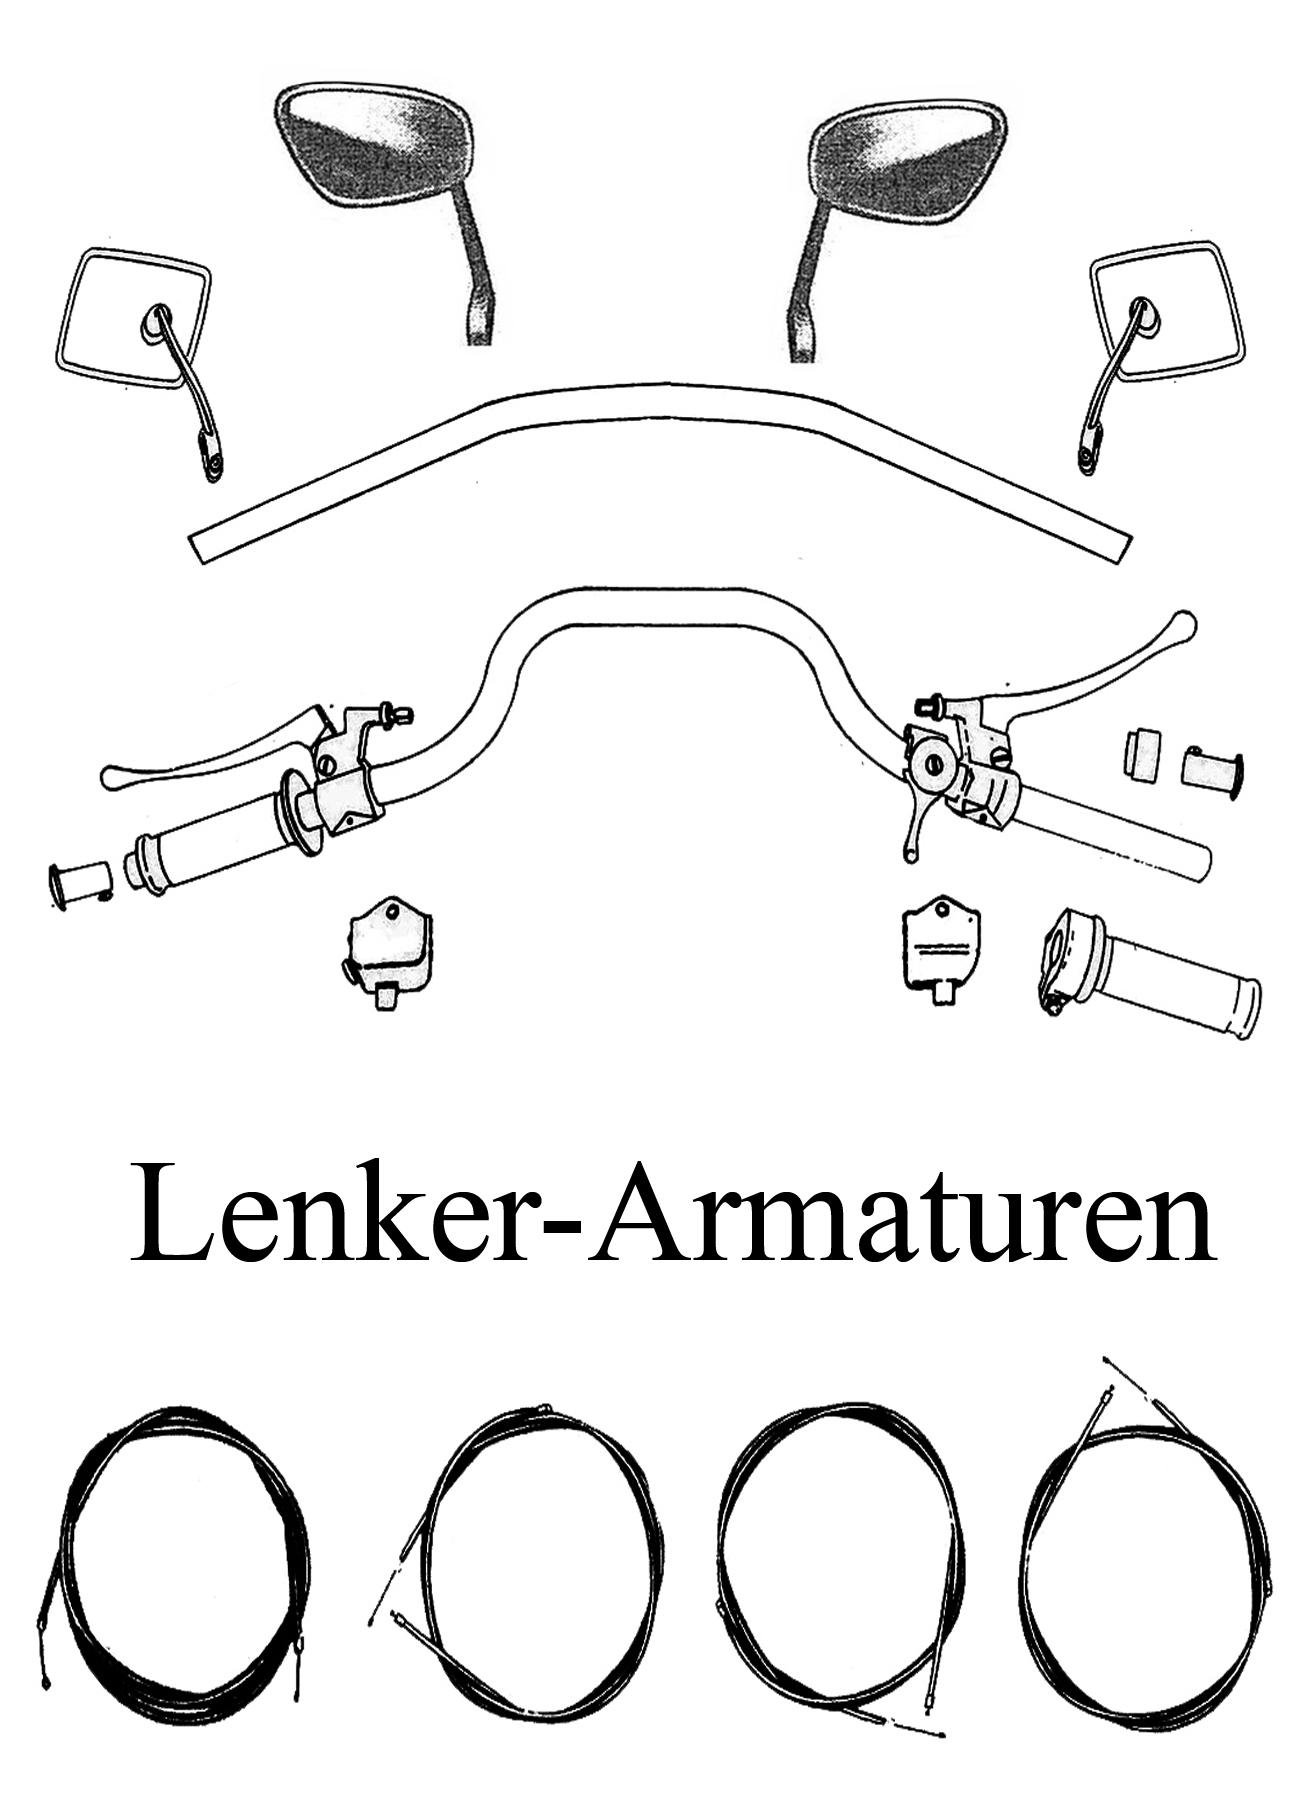 DDR-Motorrad MZ TS 125 150 Ersatzteile Lenker Armaturen